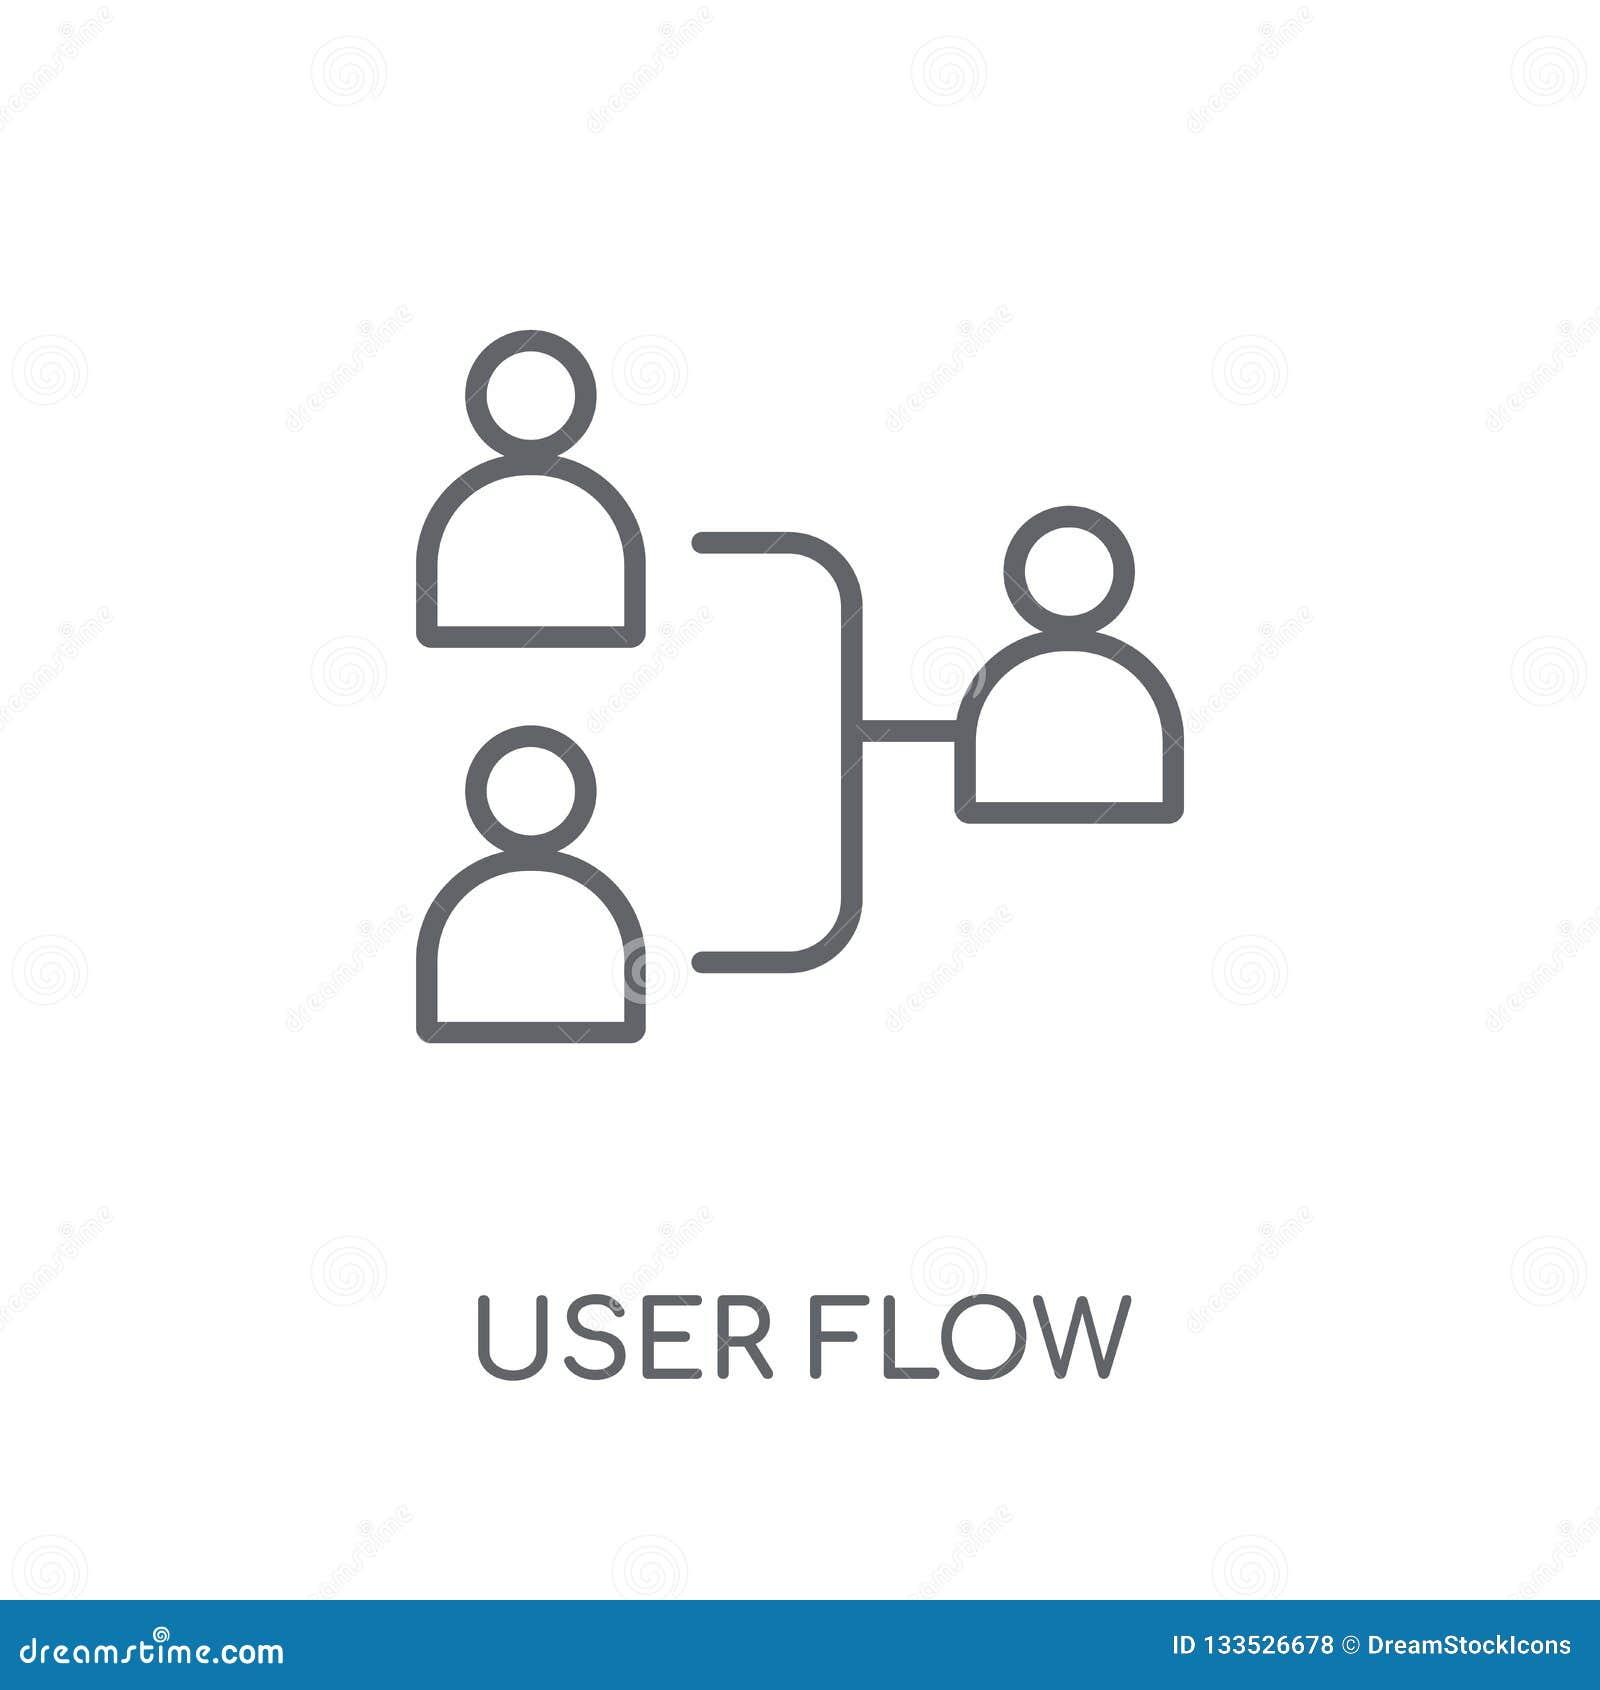 Lineare Ikone des Benutzerflusses Modernes Entwurf Benutzerfluss-Logokonzept an